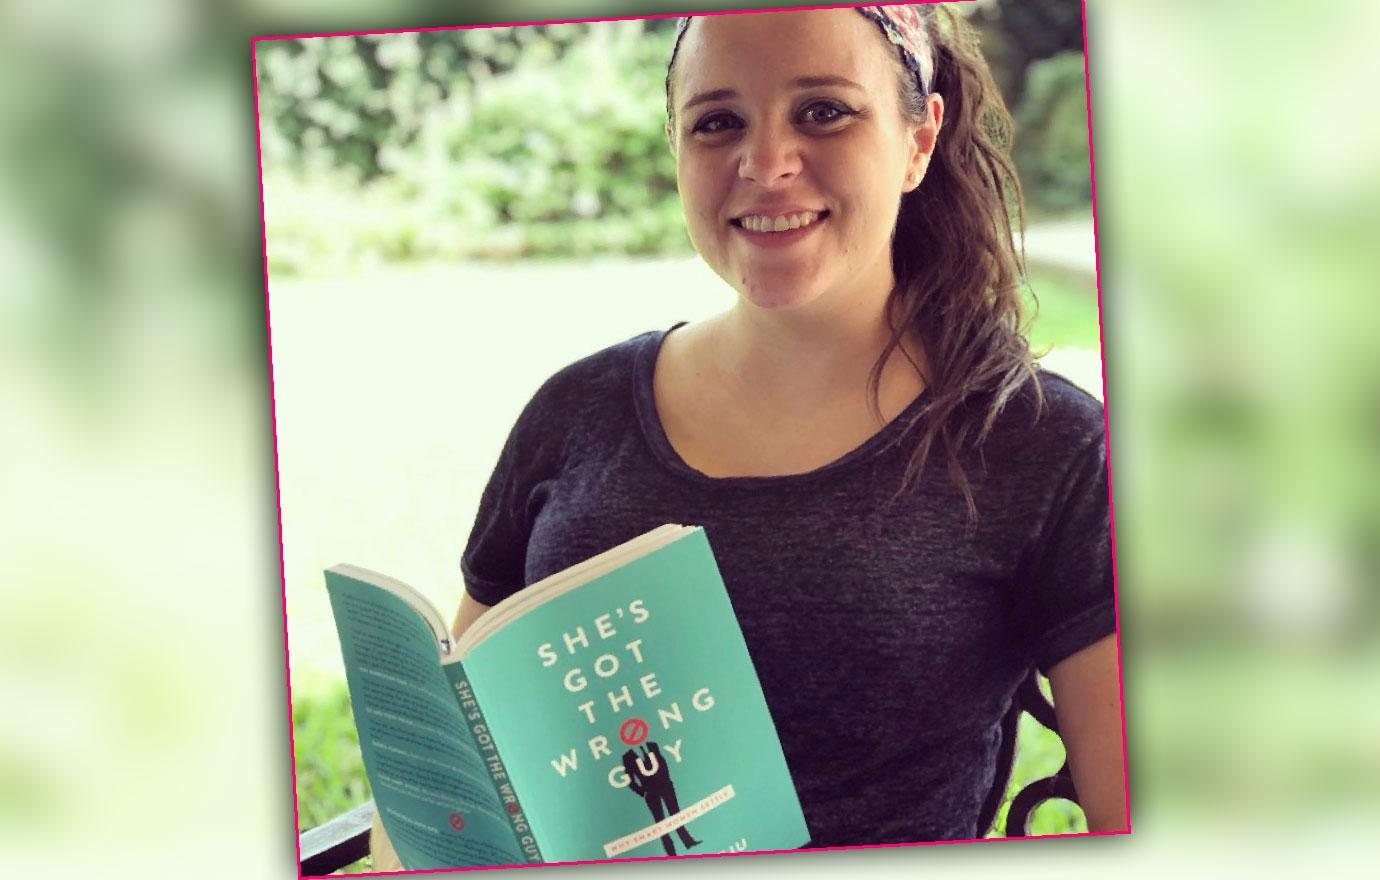 jinger duggar recommends advice book to single women